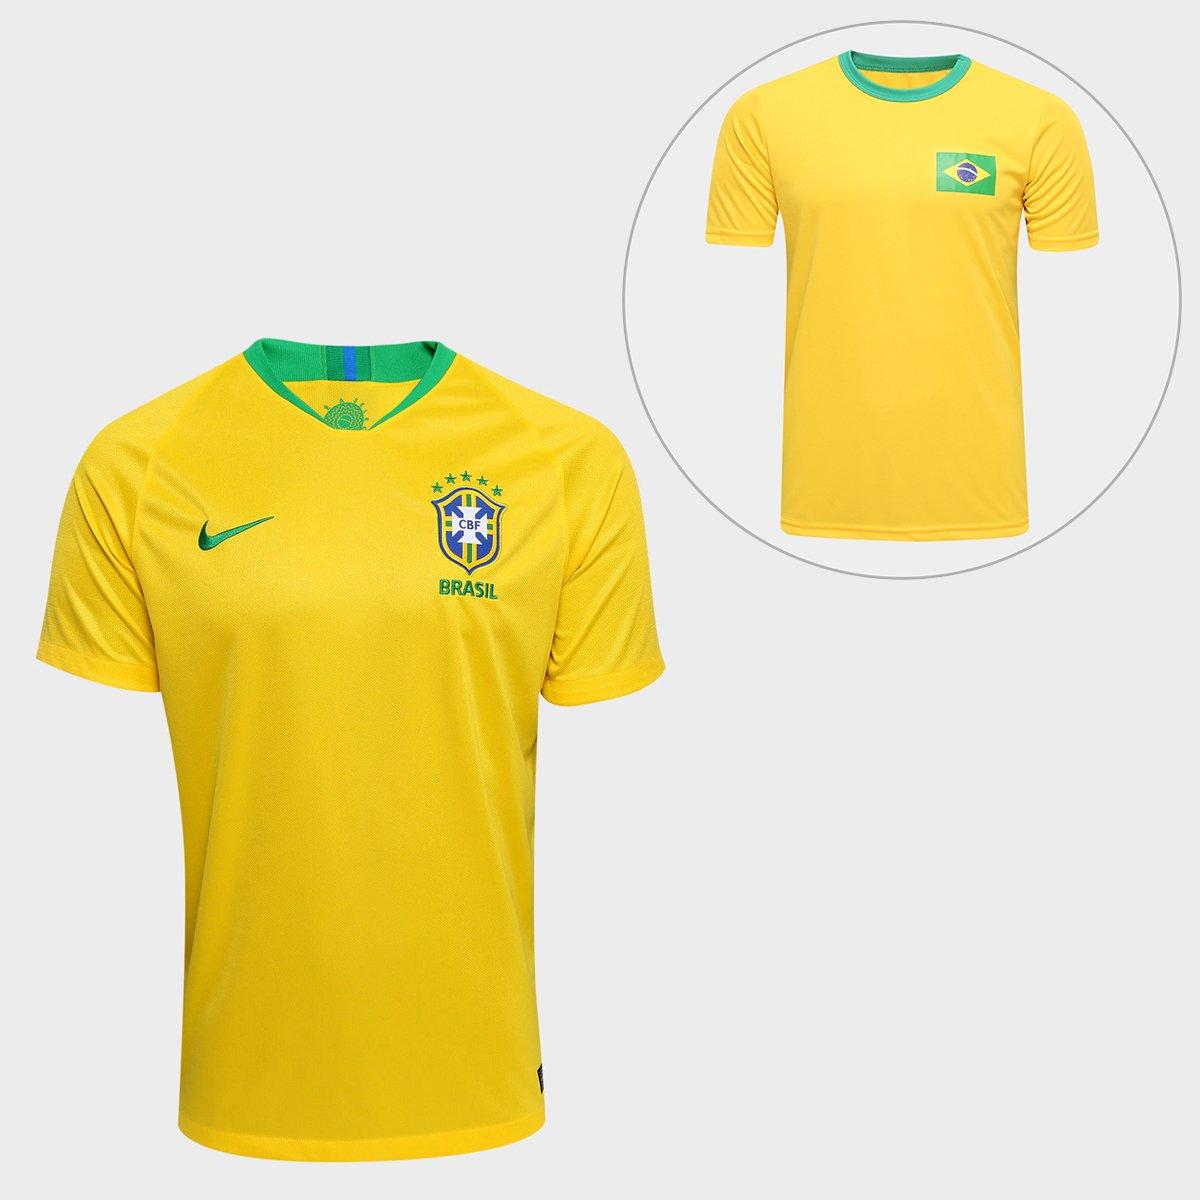 Kit Torcida Brasil - Camisa Nike Seleção Brasil I 2018 s nº + Camisa  Torcedor - Compre Agora  9a6d0511323cb